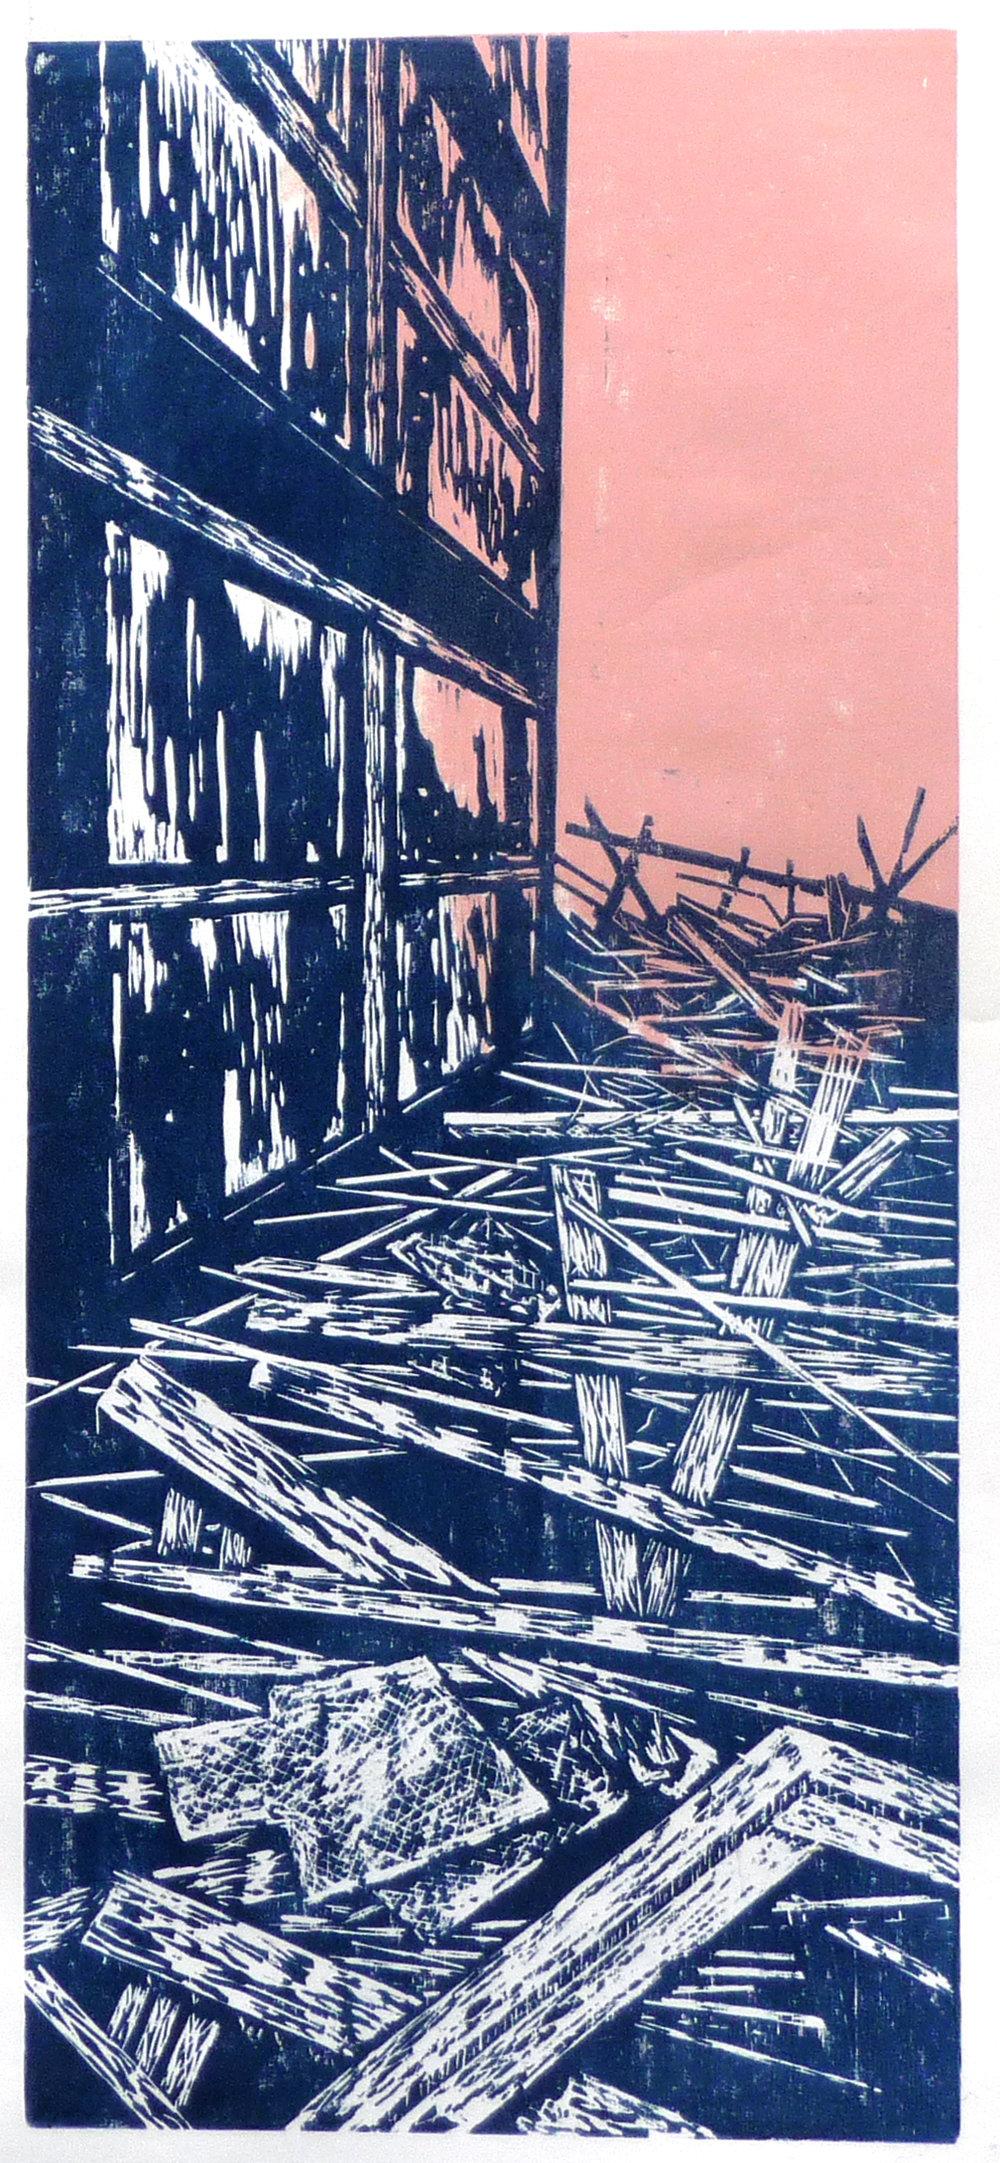 Bretter, woodcut, 29 x 67 cm, 2018